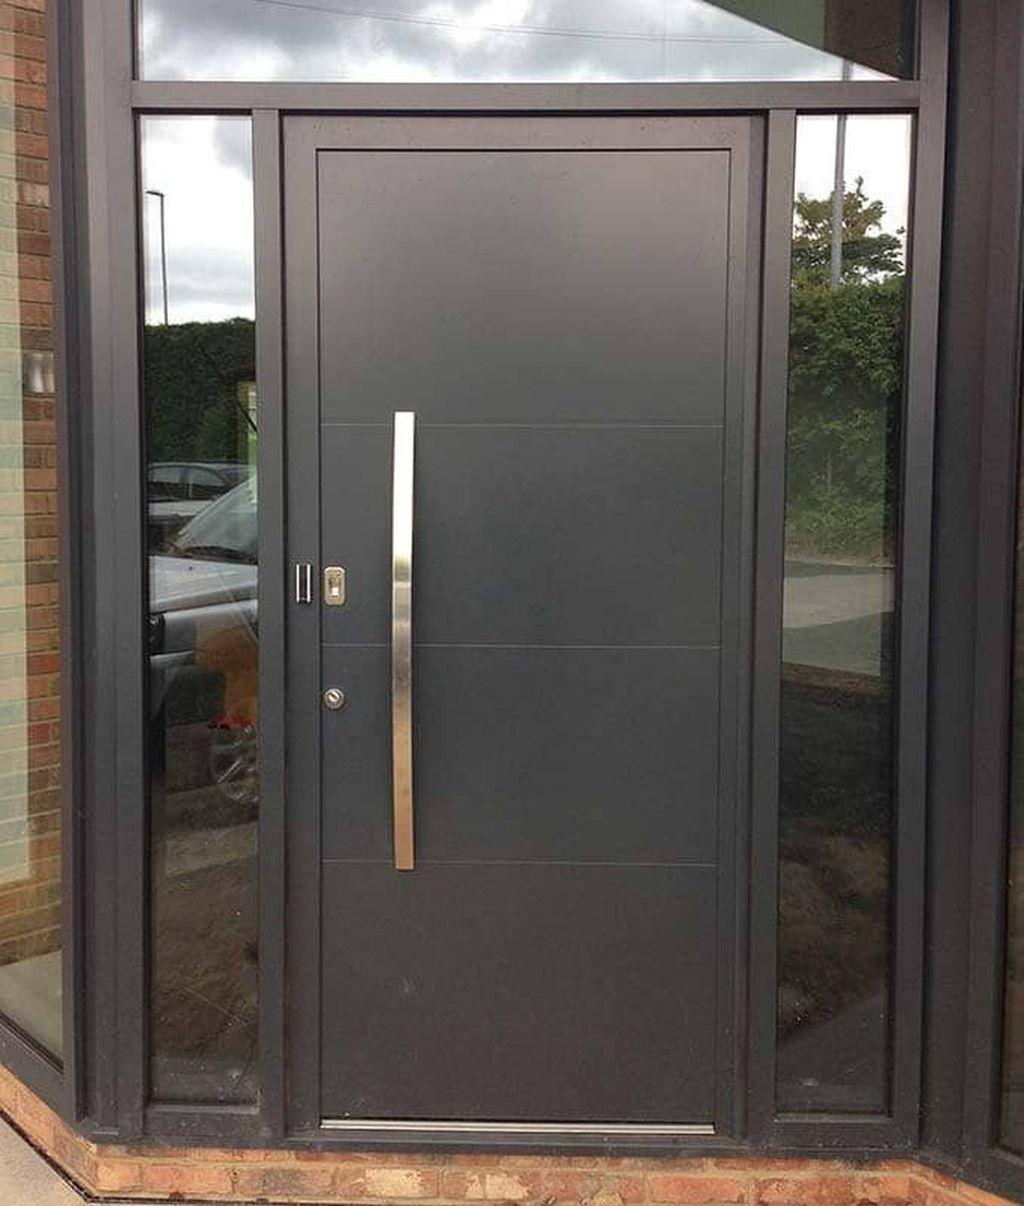 The Best Modern Front Entrance Exterior Design Ideas 11